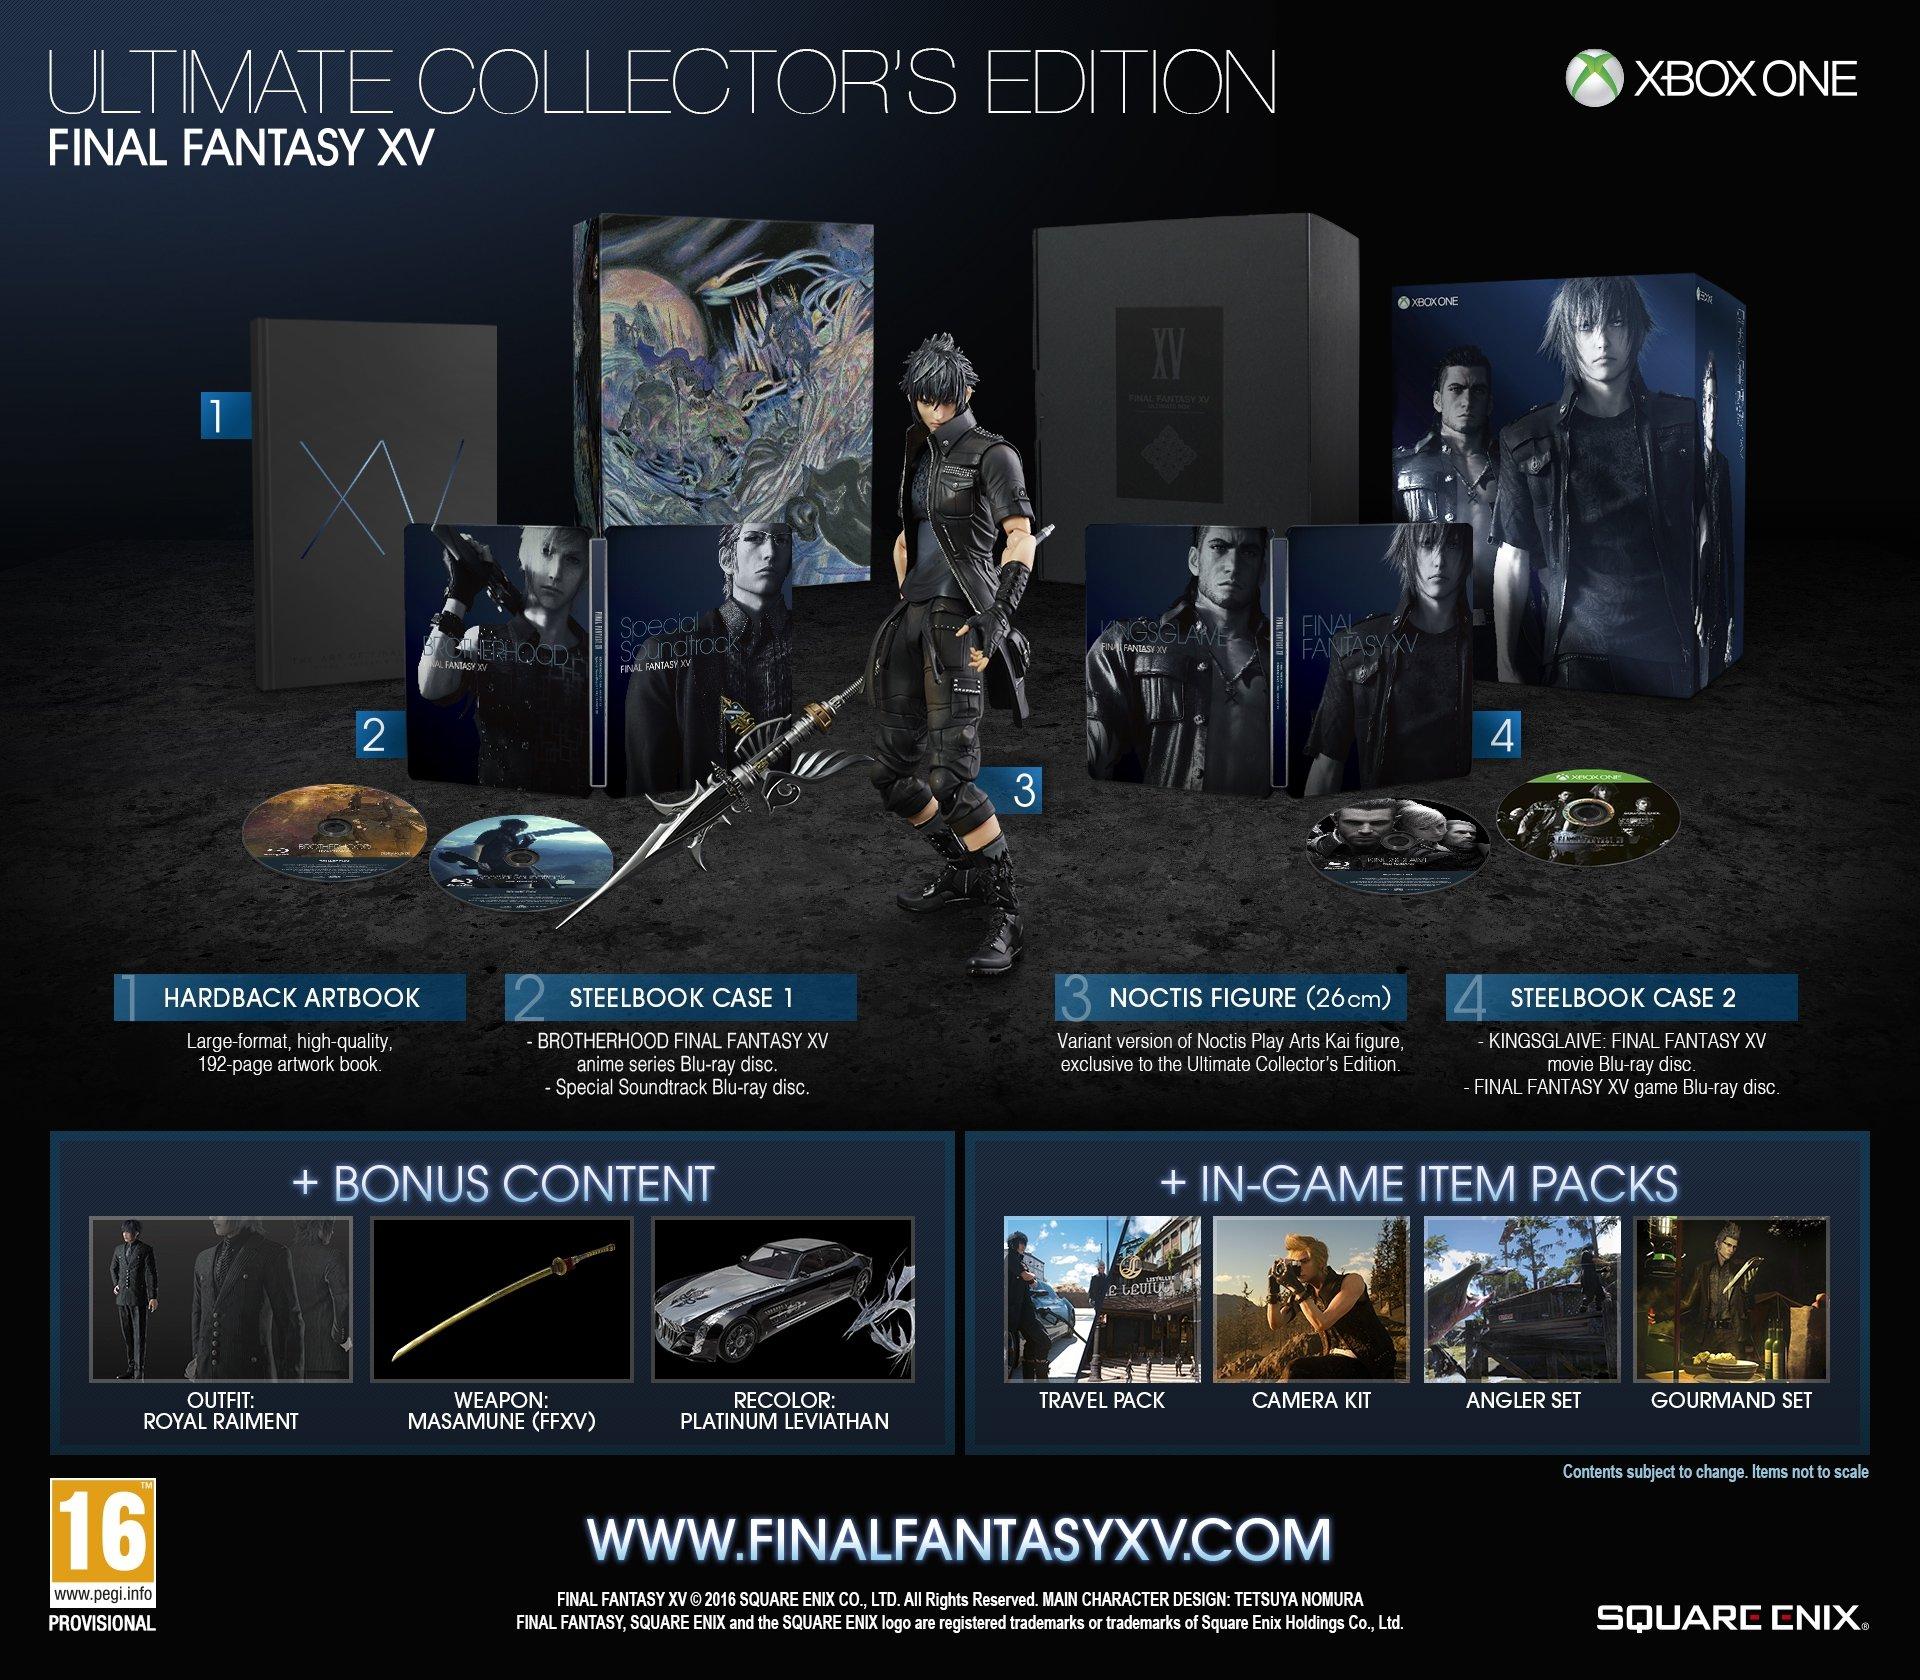 FINAL FANTASY XV Ultimate Collector's Edition [Xbox One